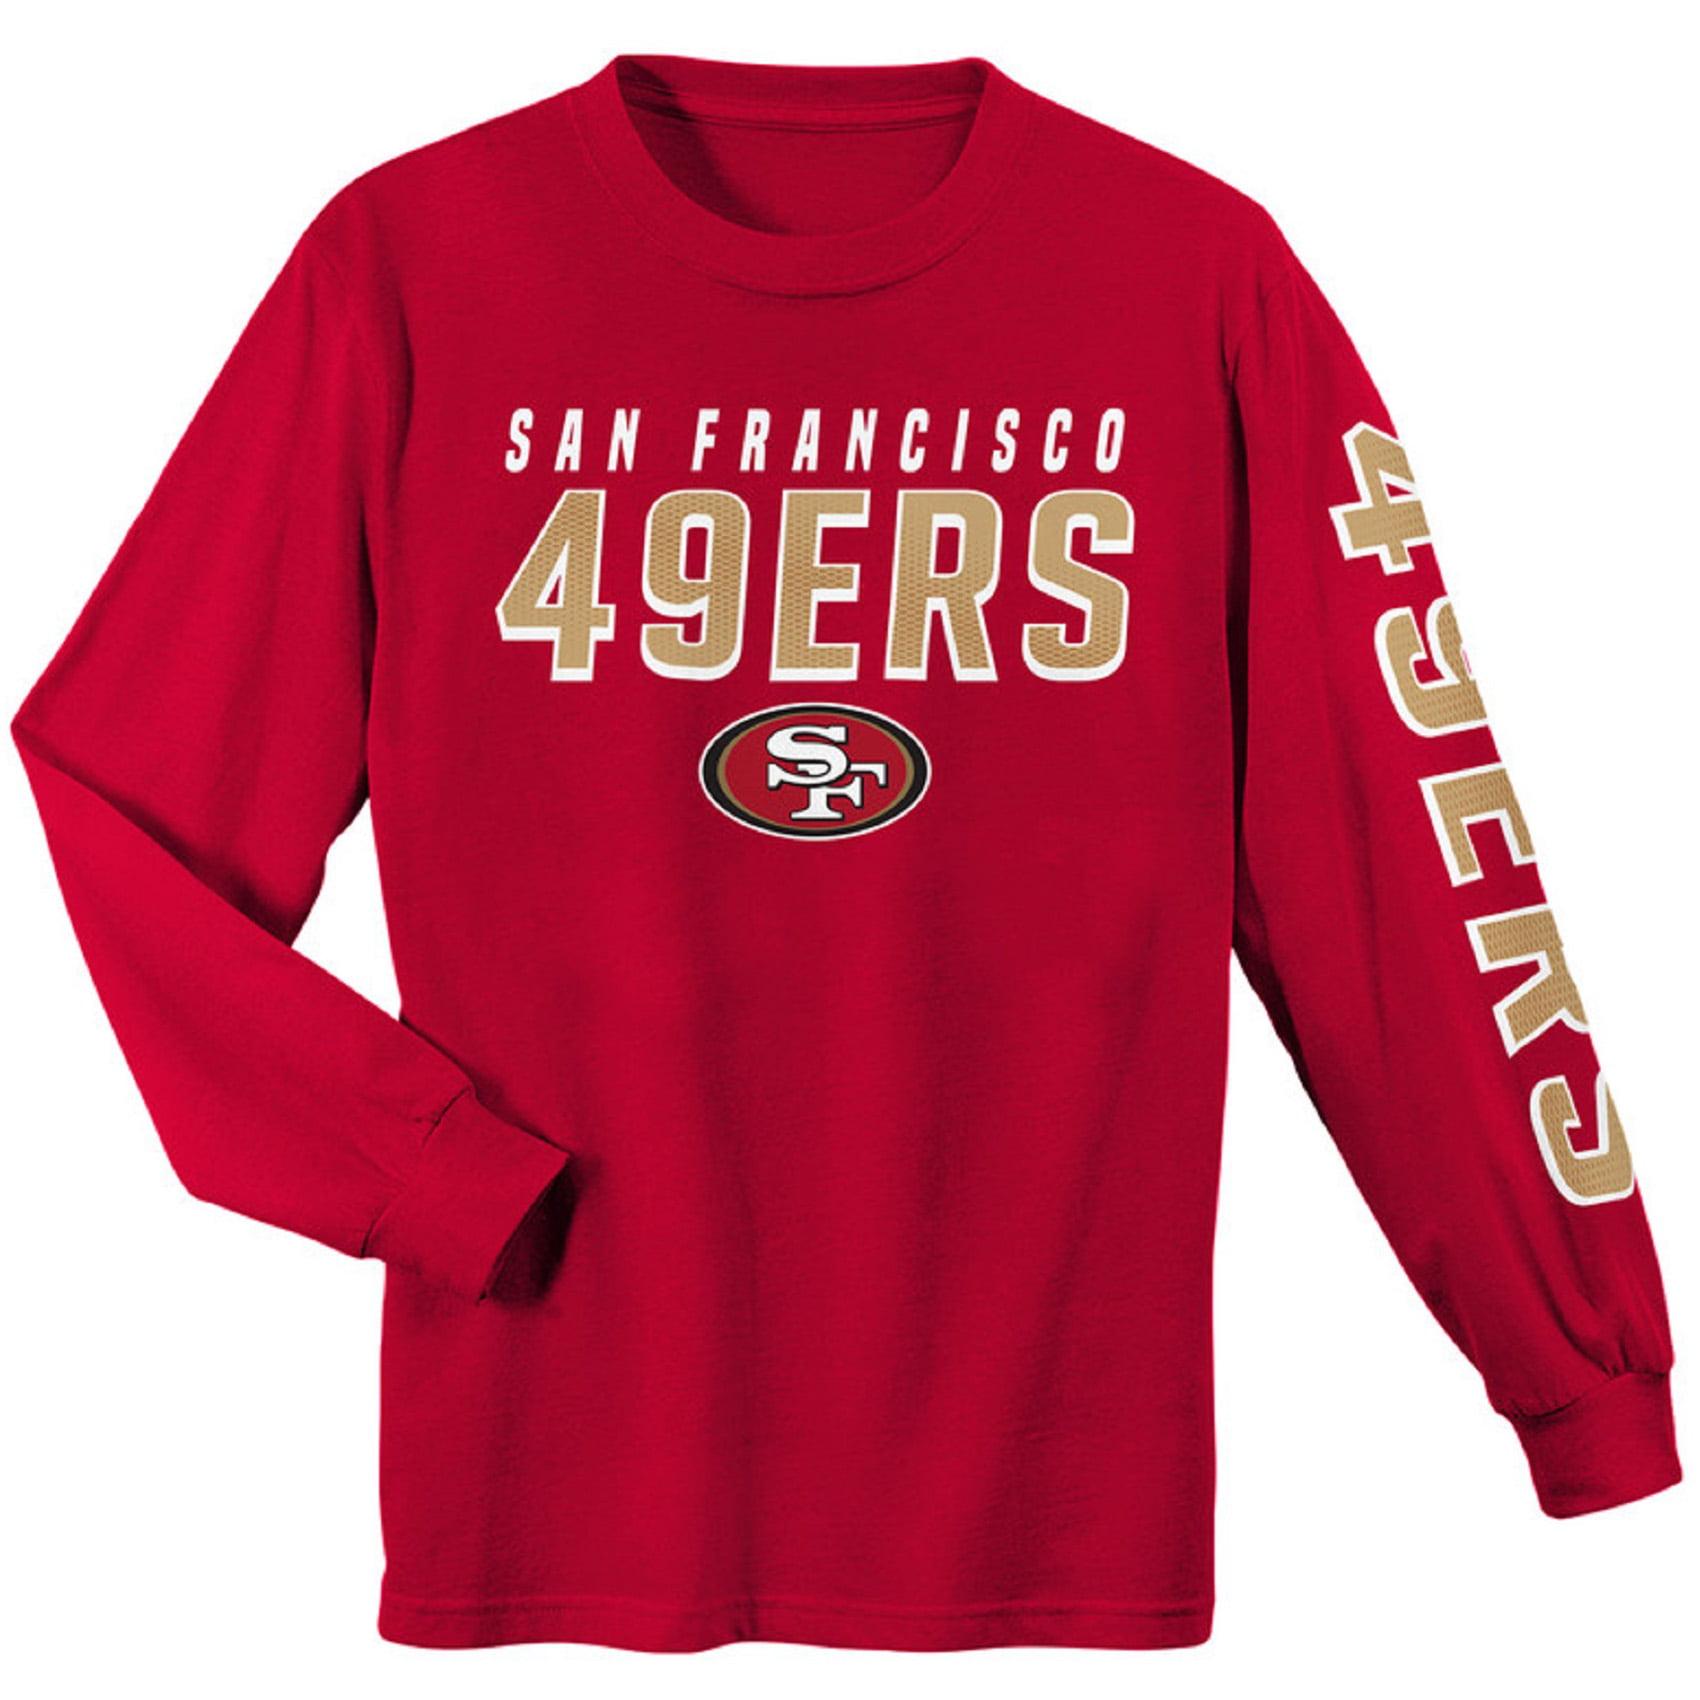 Youth Scarlet San Francisco 49ers Sleeve Hit Long Sleeve T-Shirt